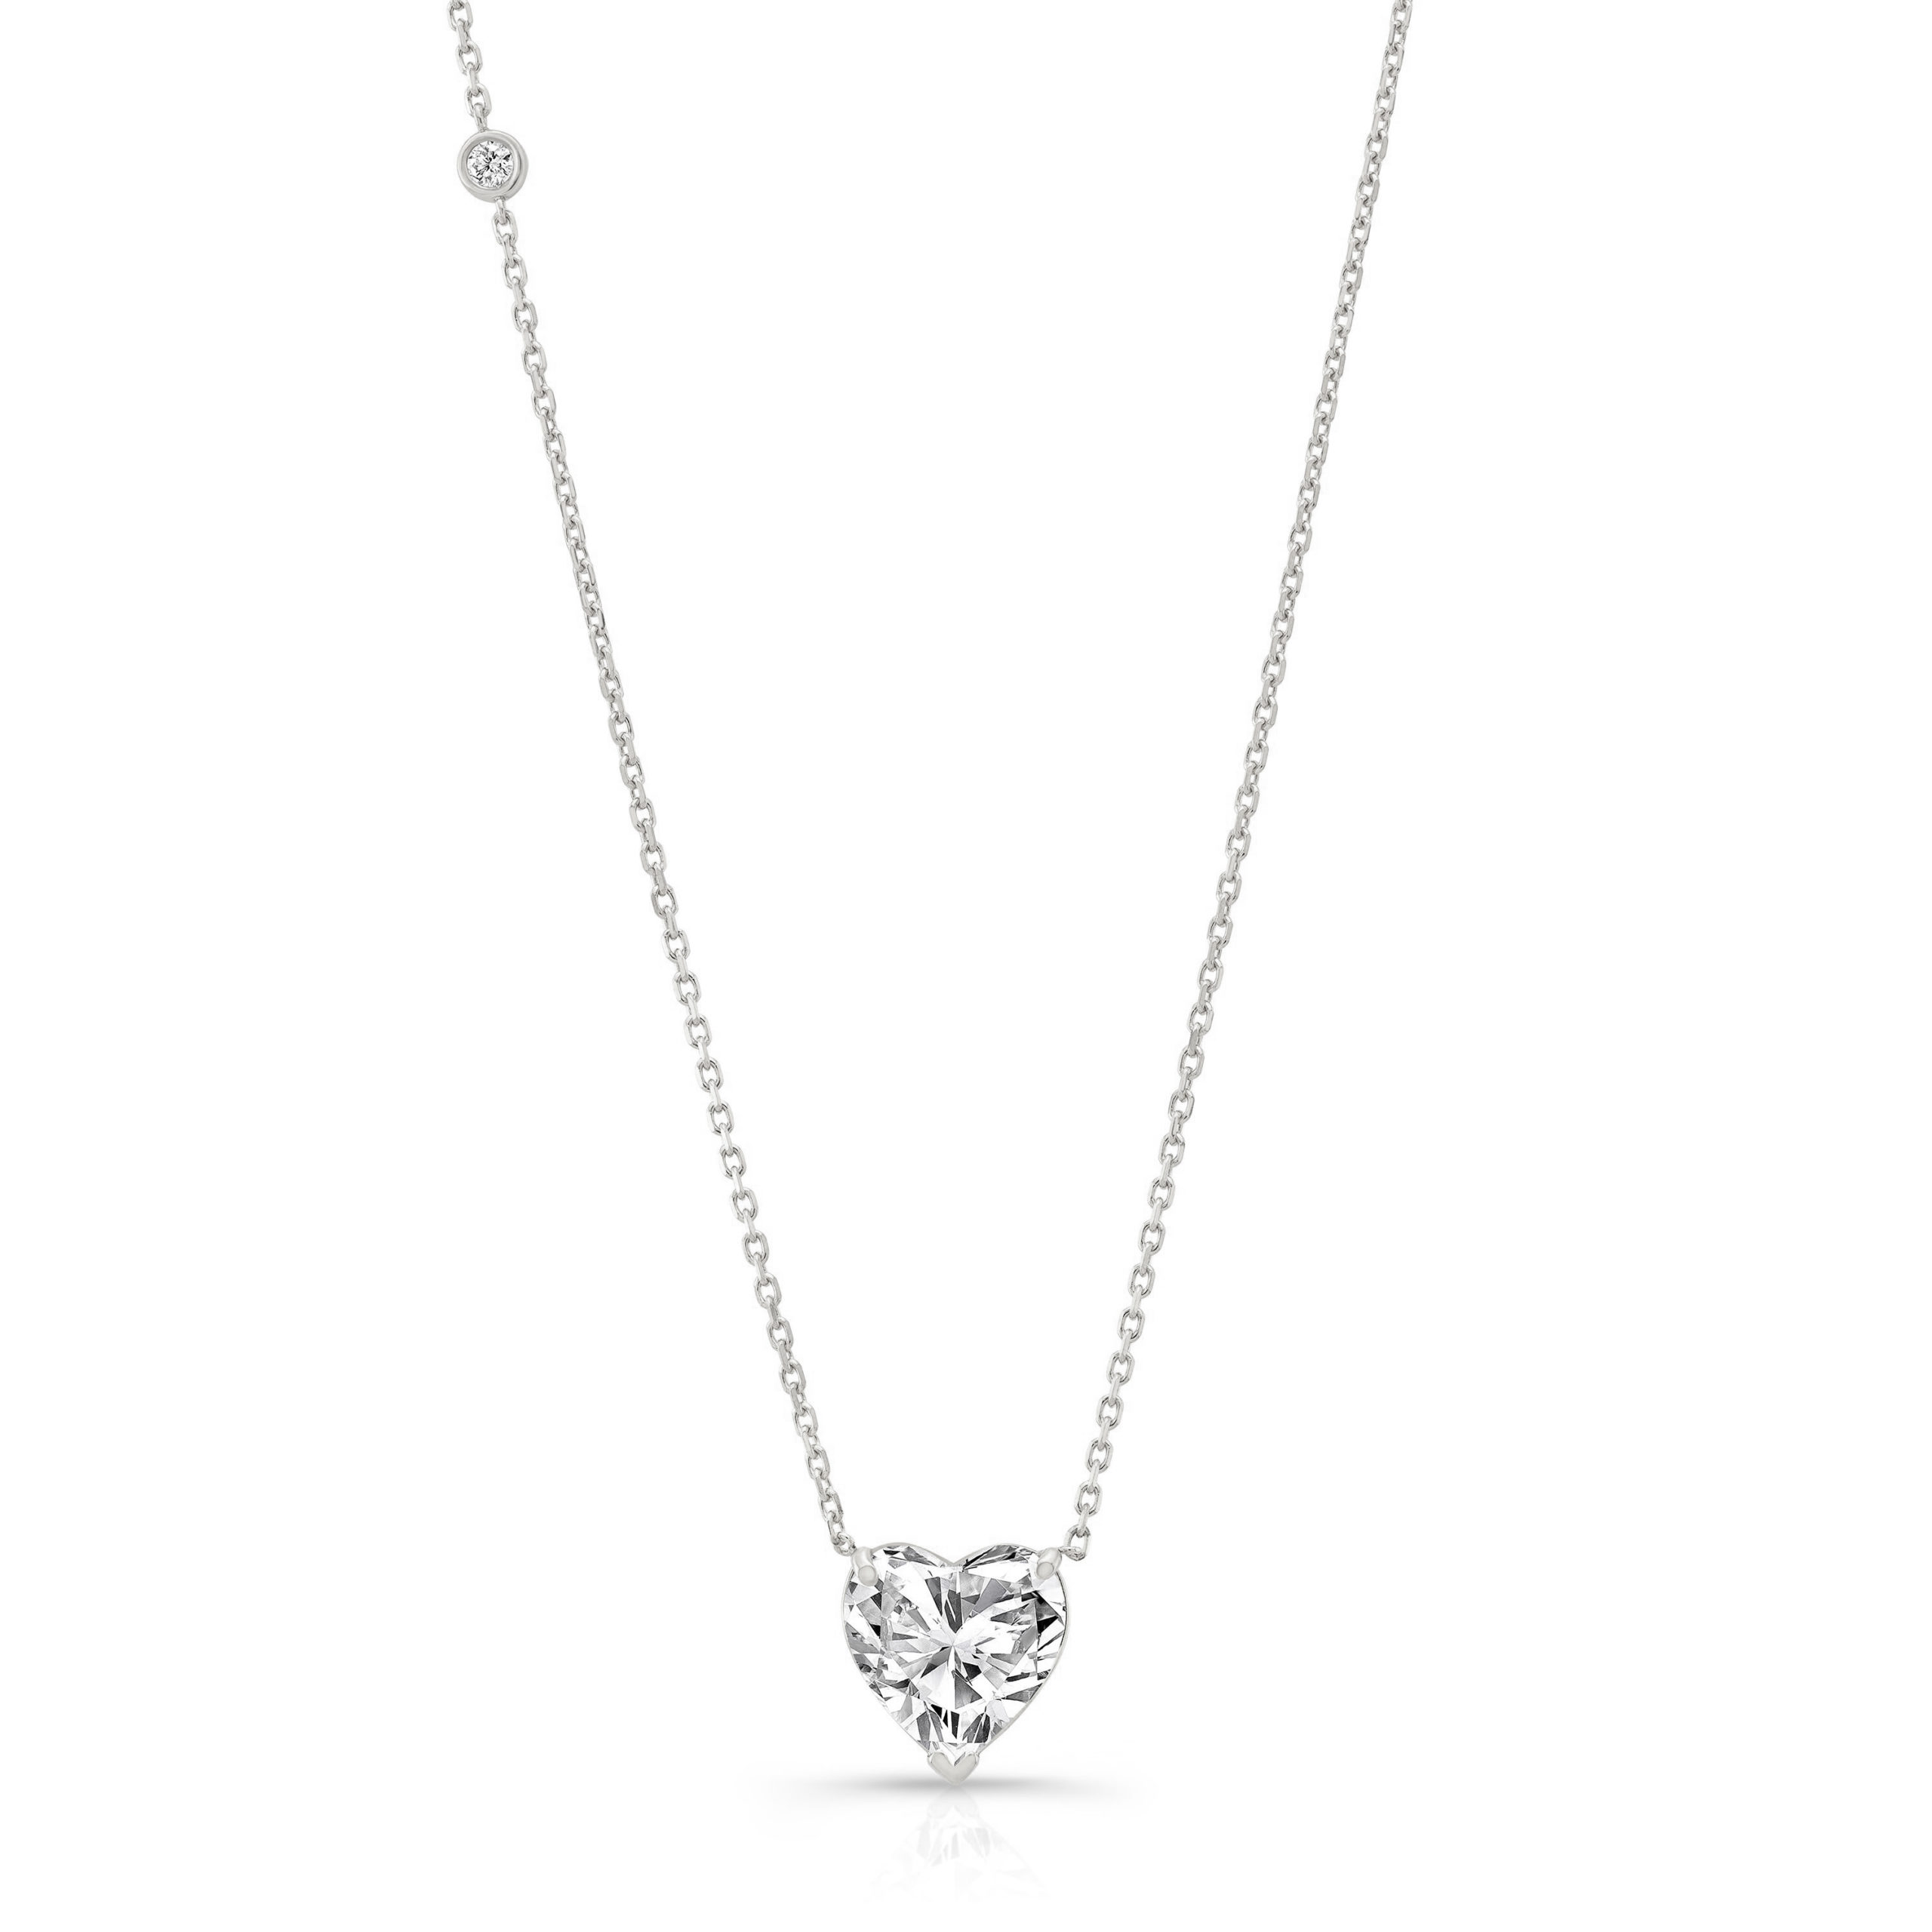 Solitaire Heart Necklace + Diamond Bezel